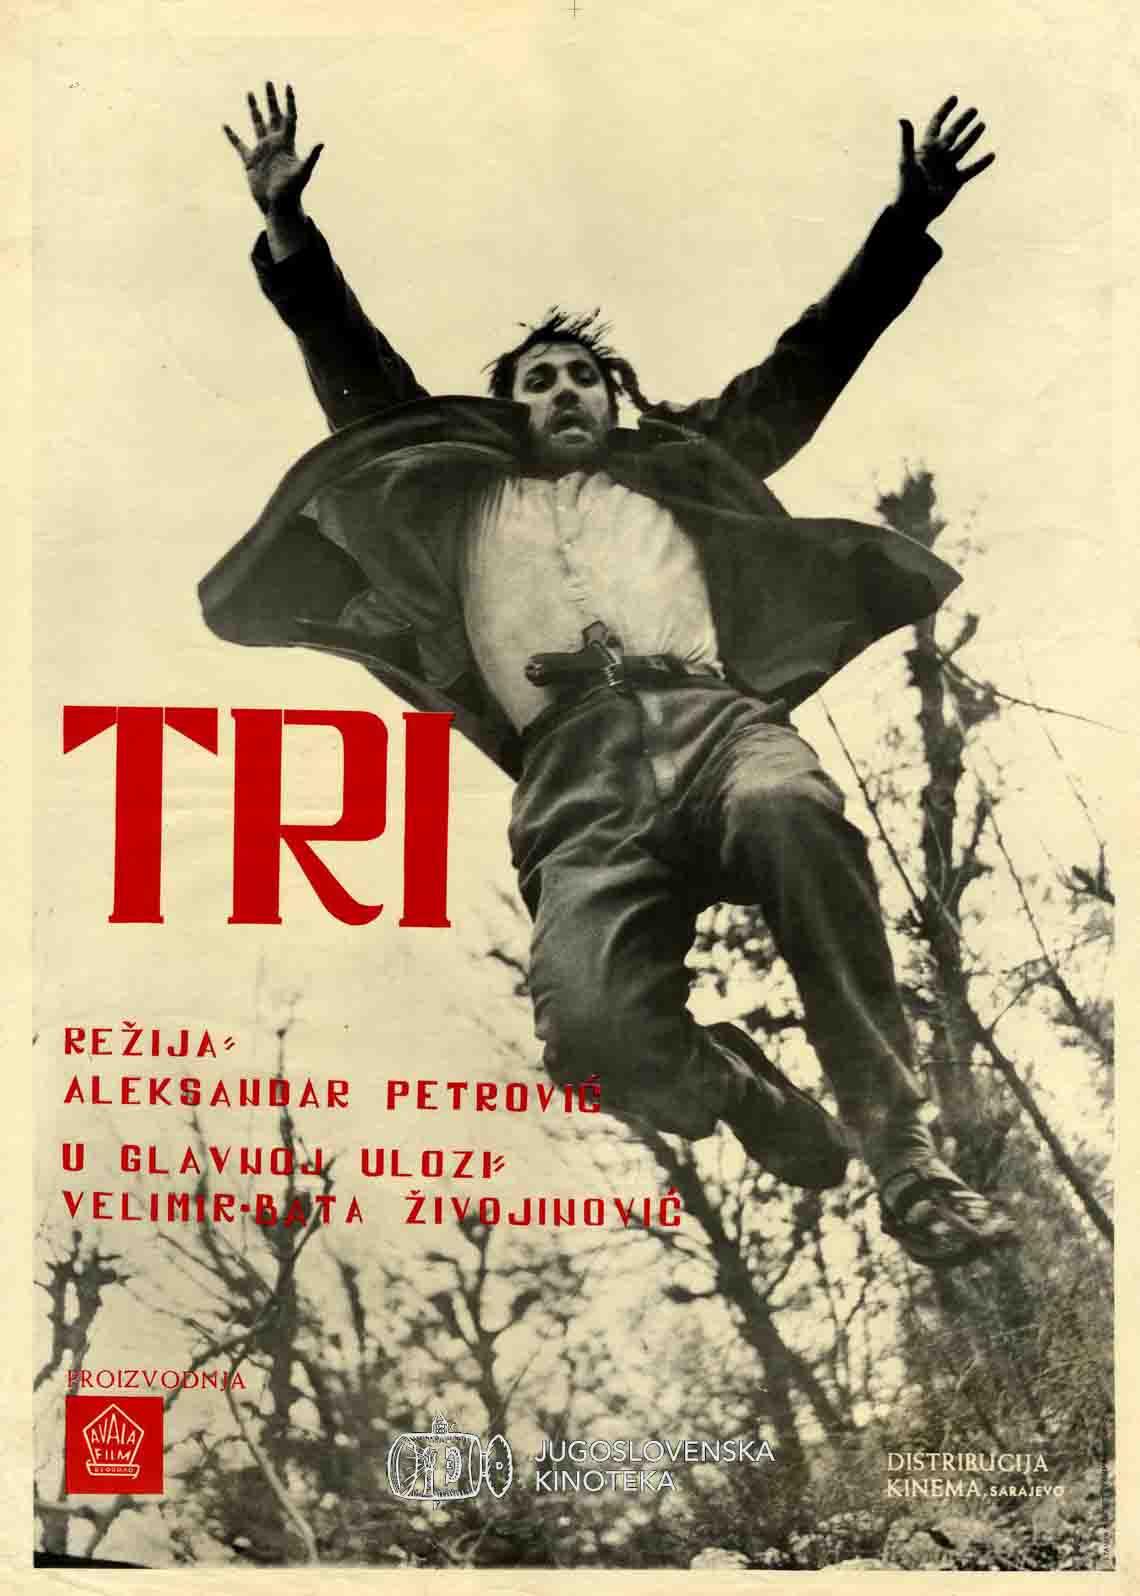 Tri (1965) – plakat – Jugoslovenska kinoteka